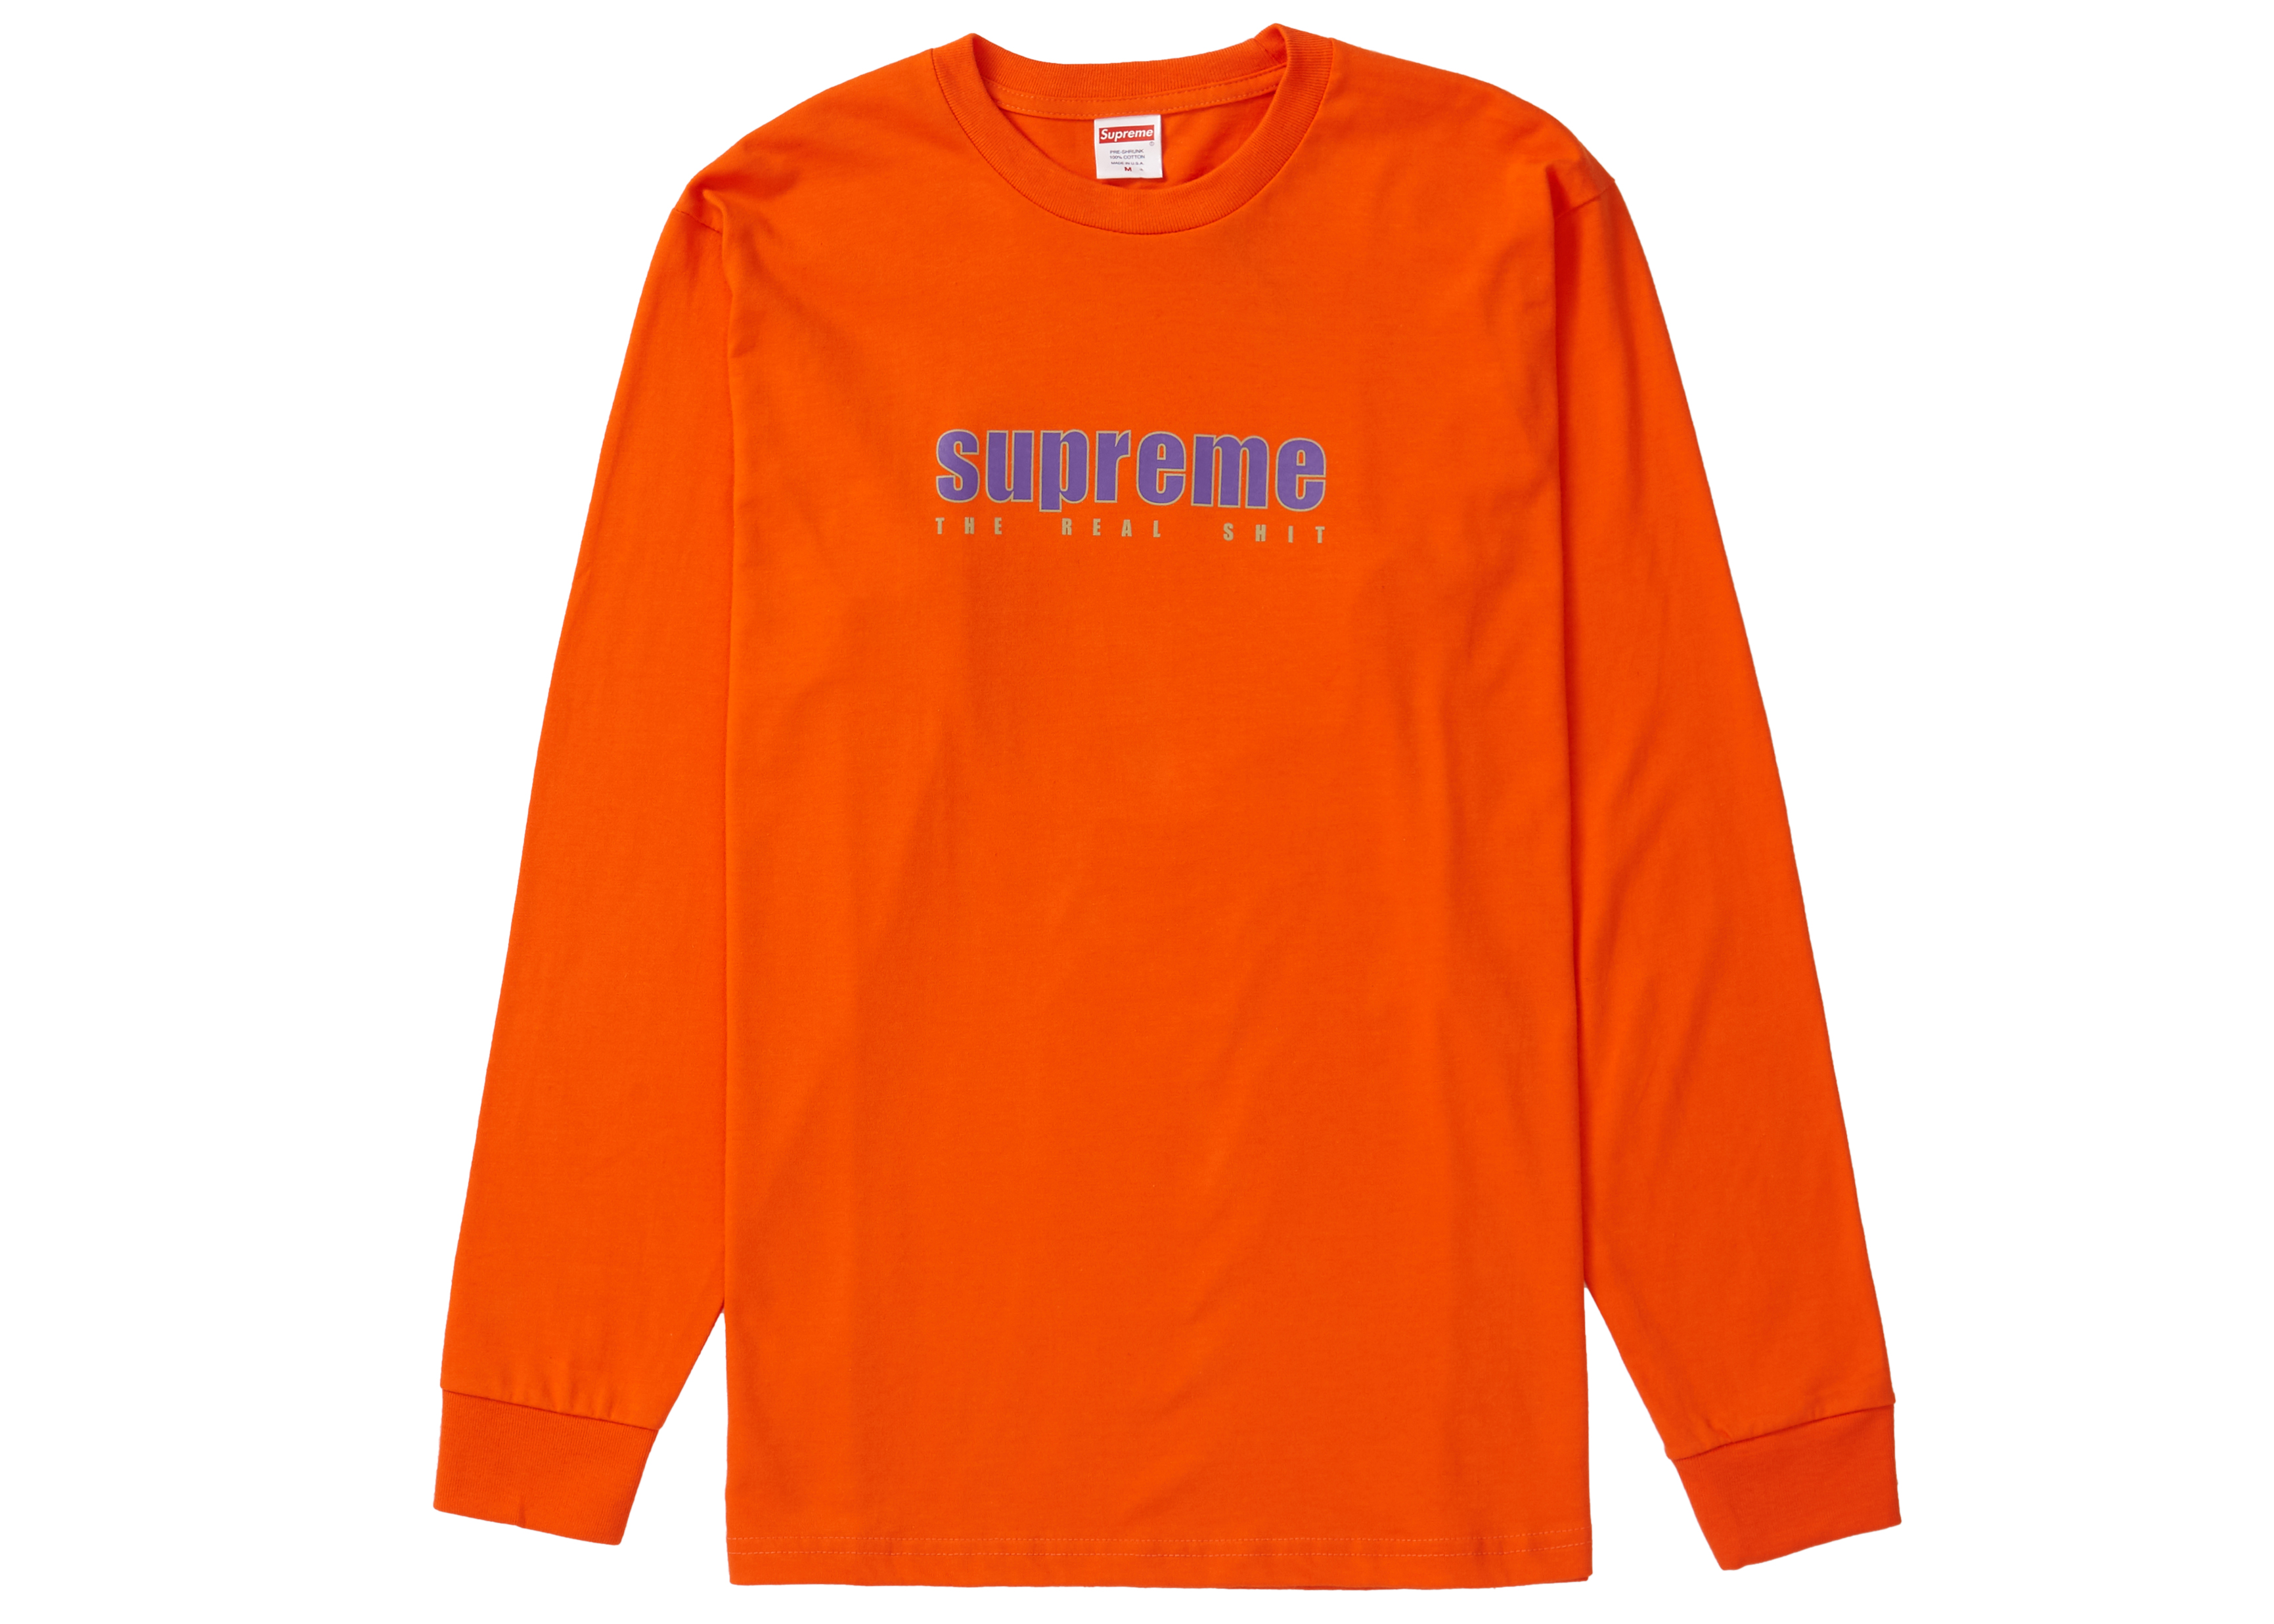 supreme t shirt orange